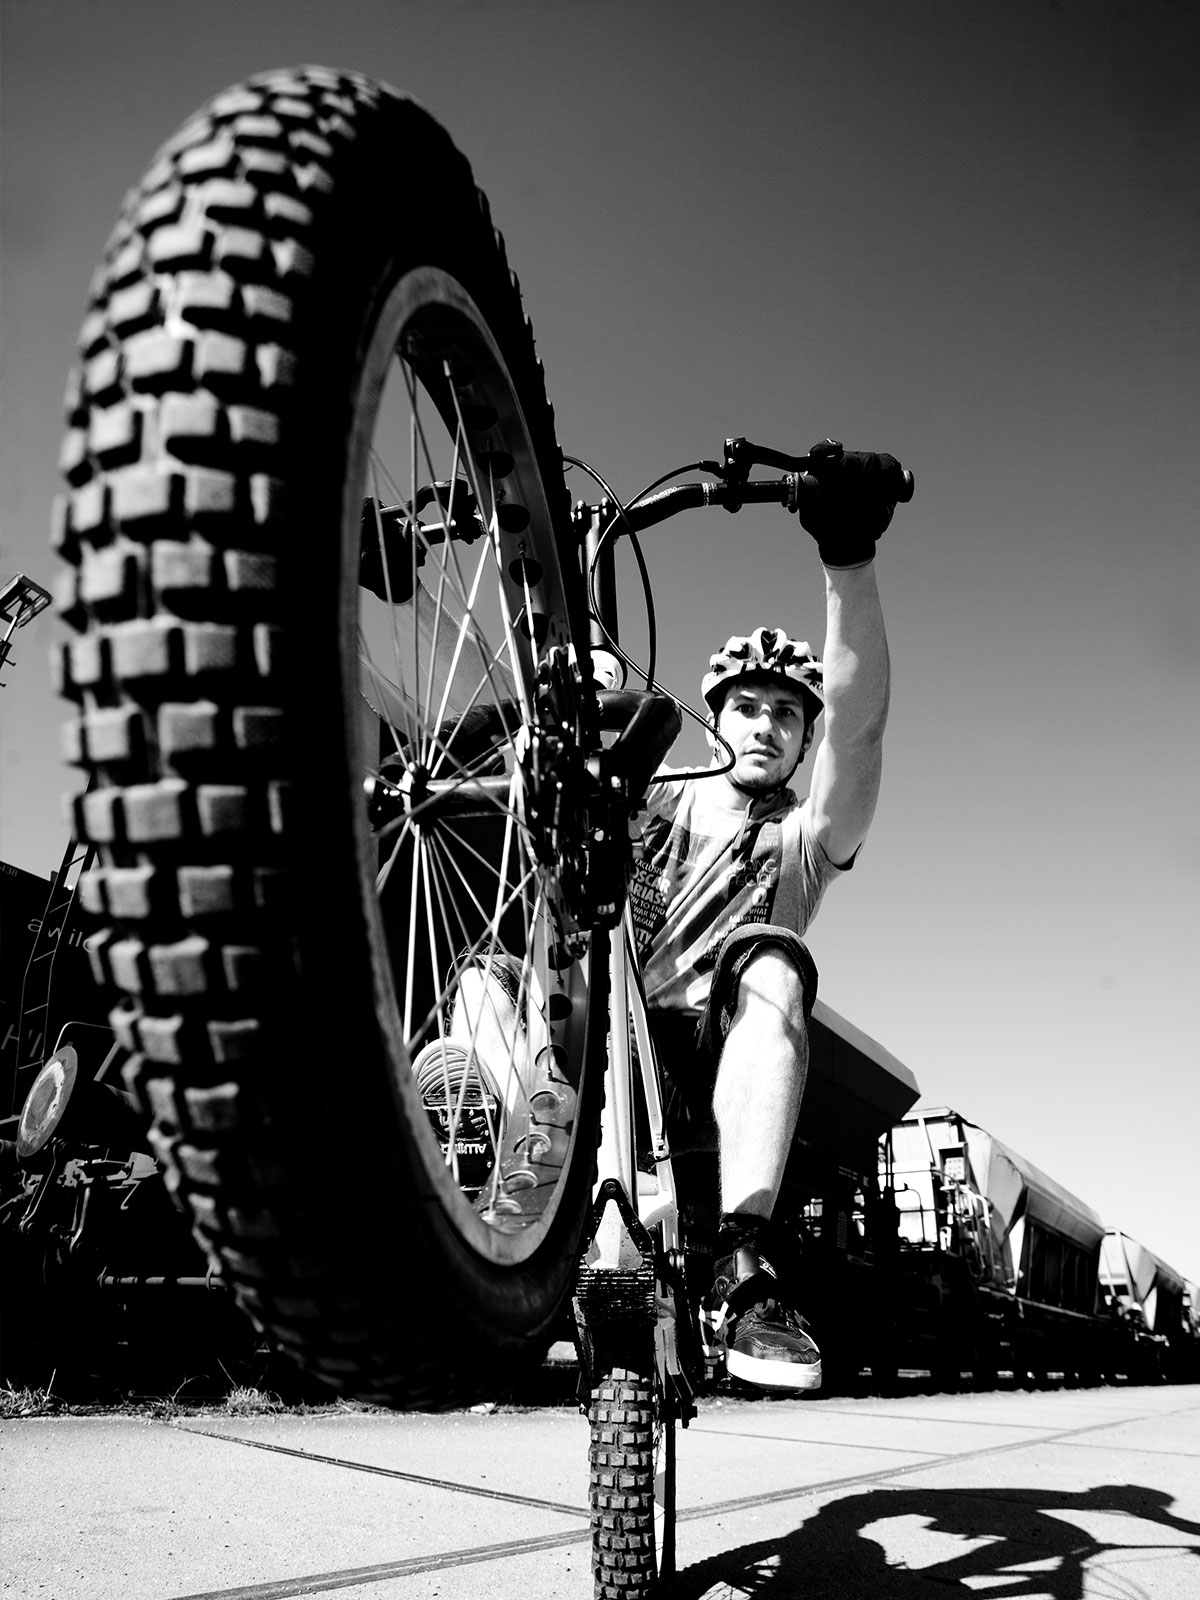 daniel-rall-bike-artist-hornberg-refernzen